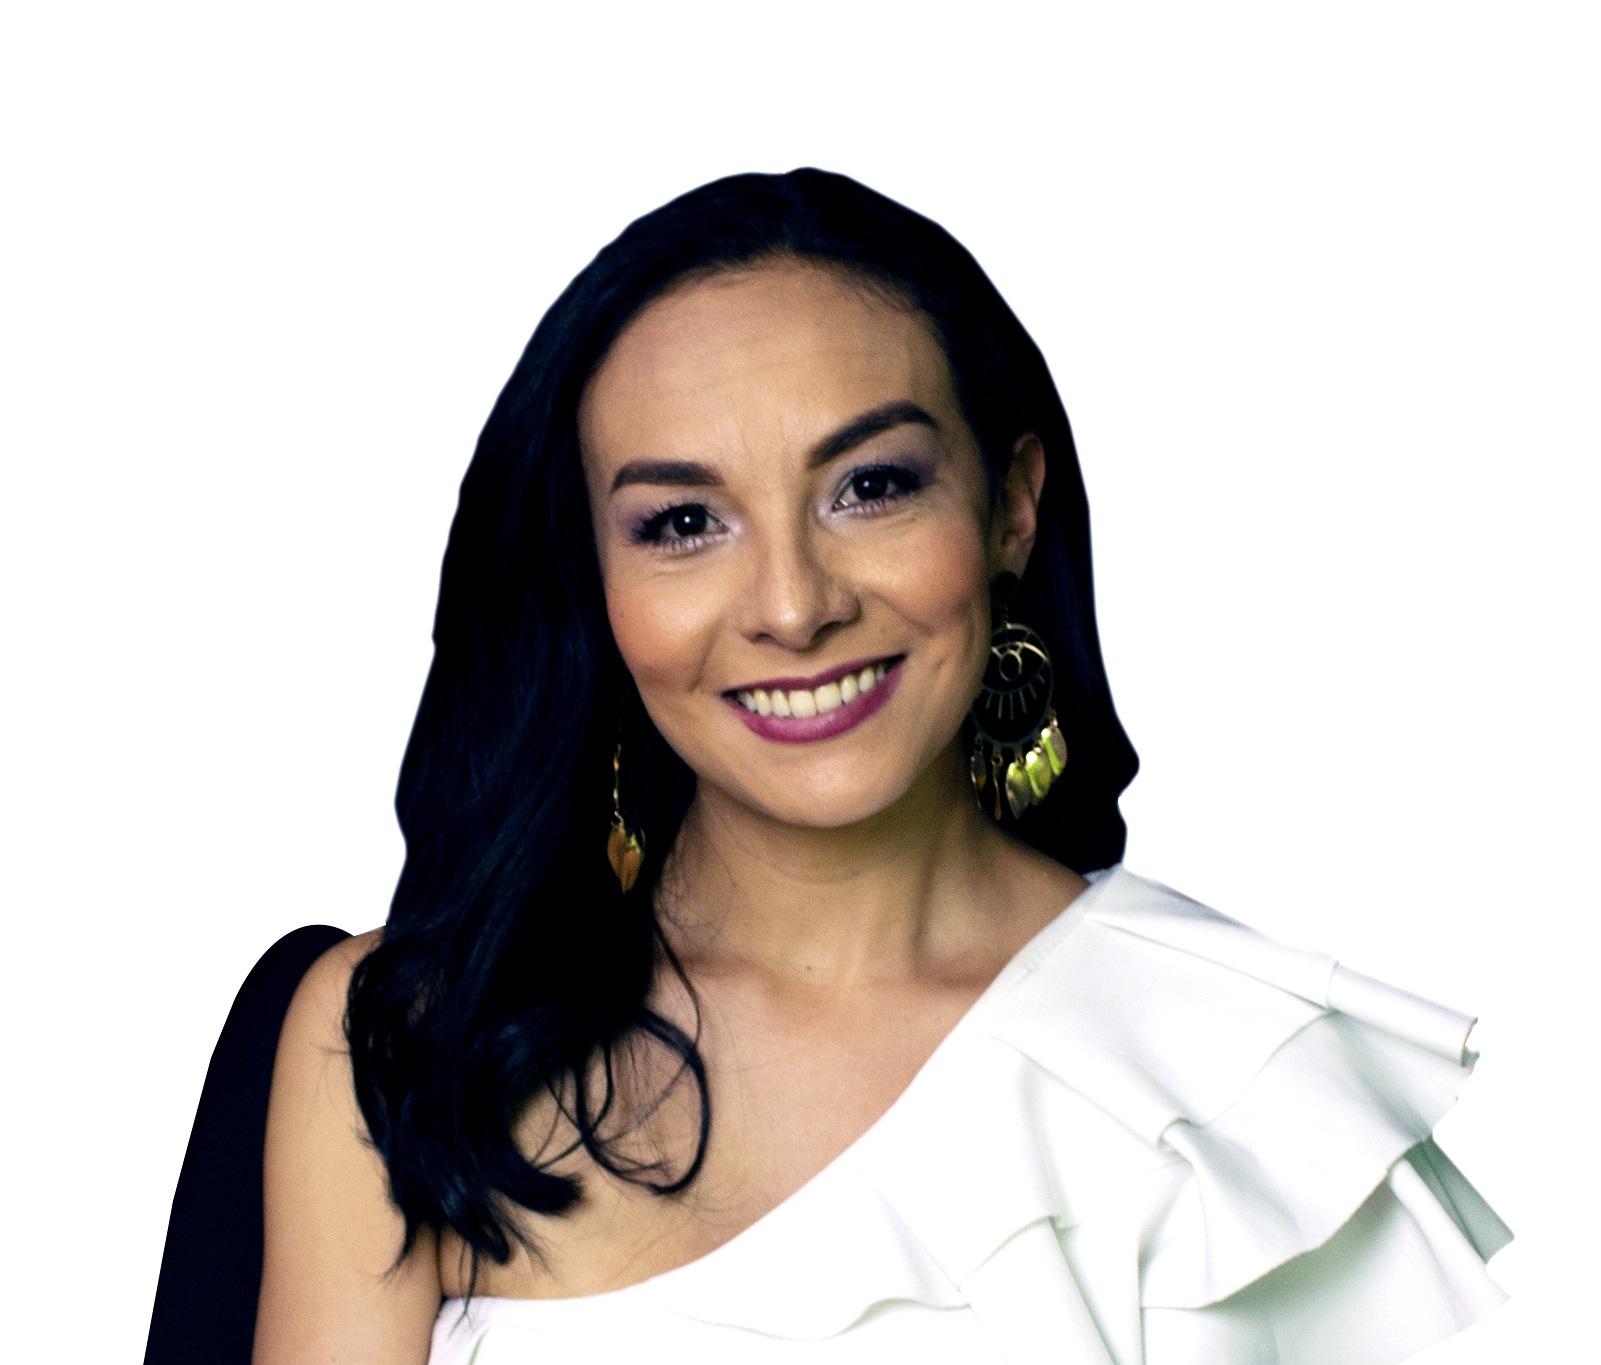 Diana Carolina Orozco